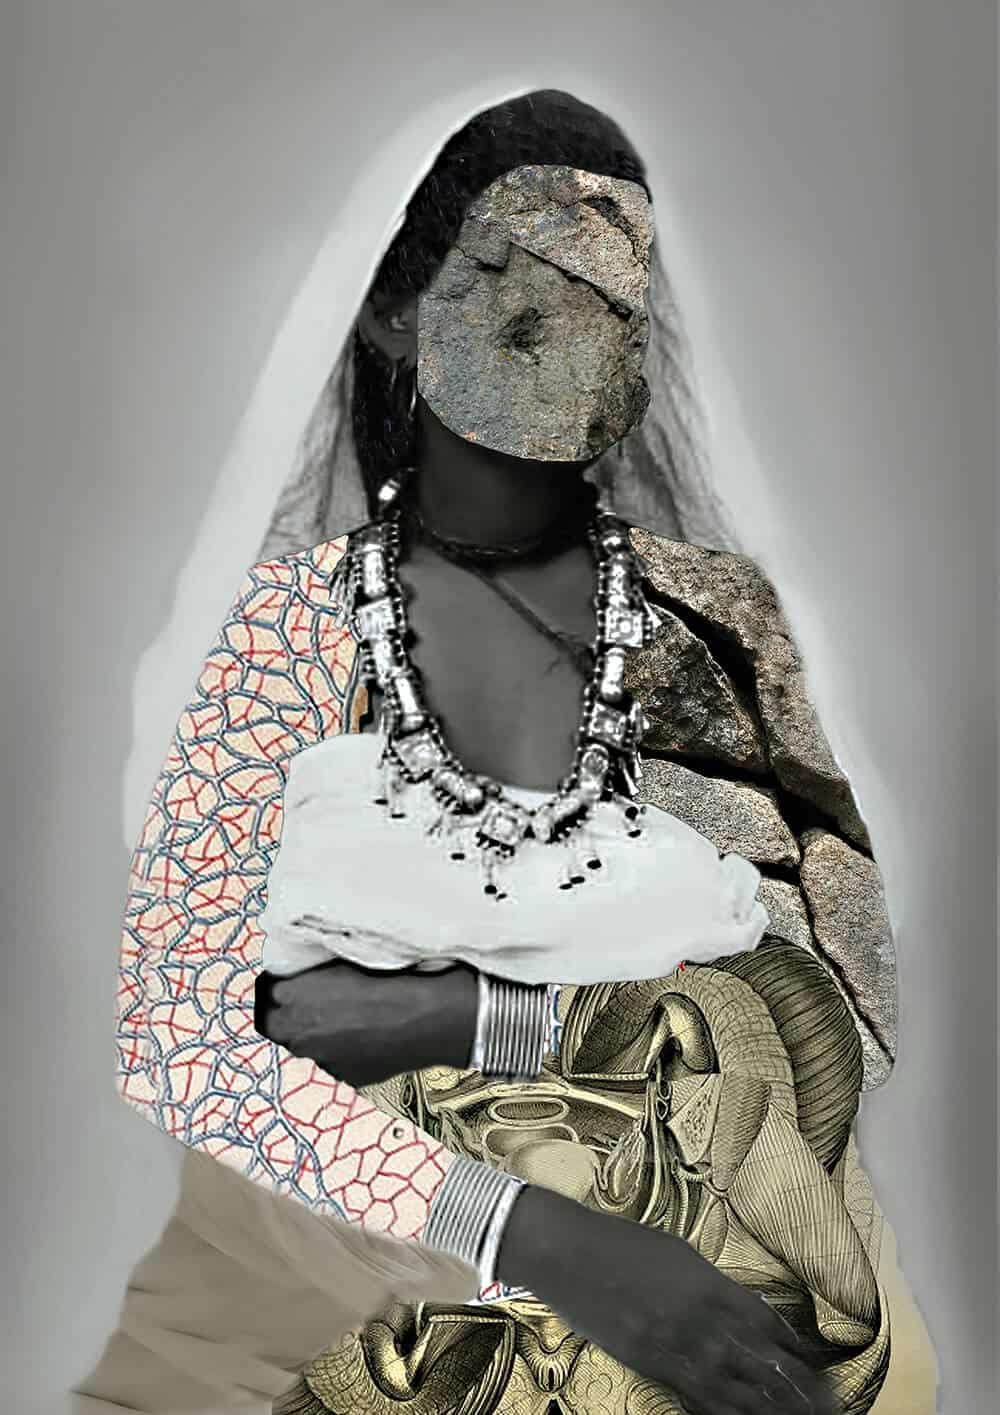 Lola Keyezua - Stone Orgasms - 2015 - #2 - 80cmx120cm